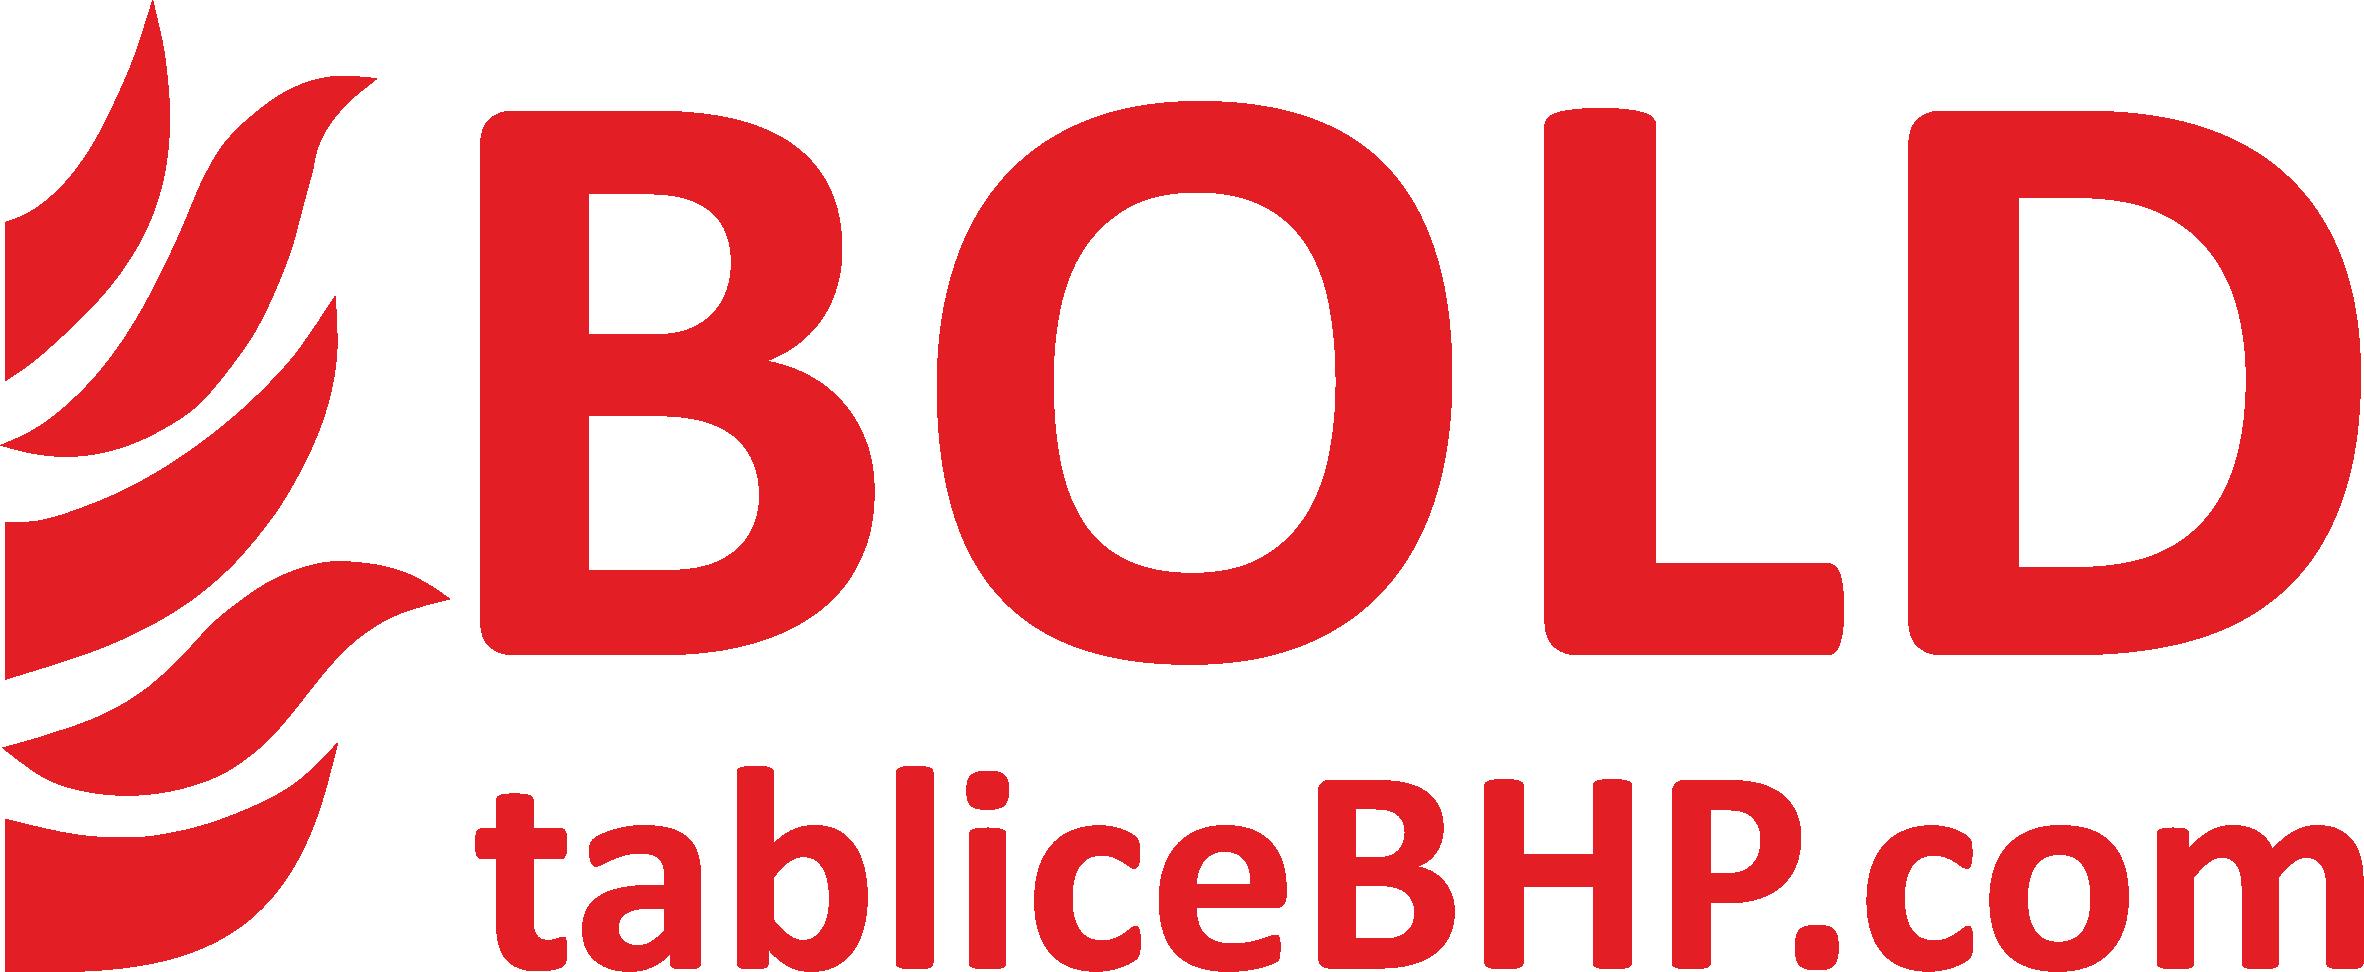 tabliceBHP.com